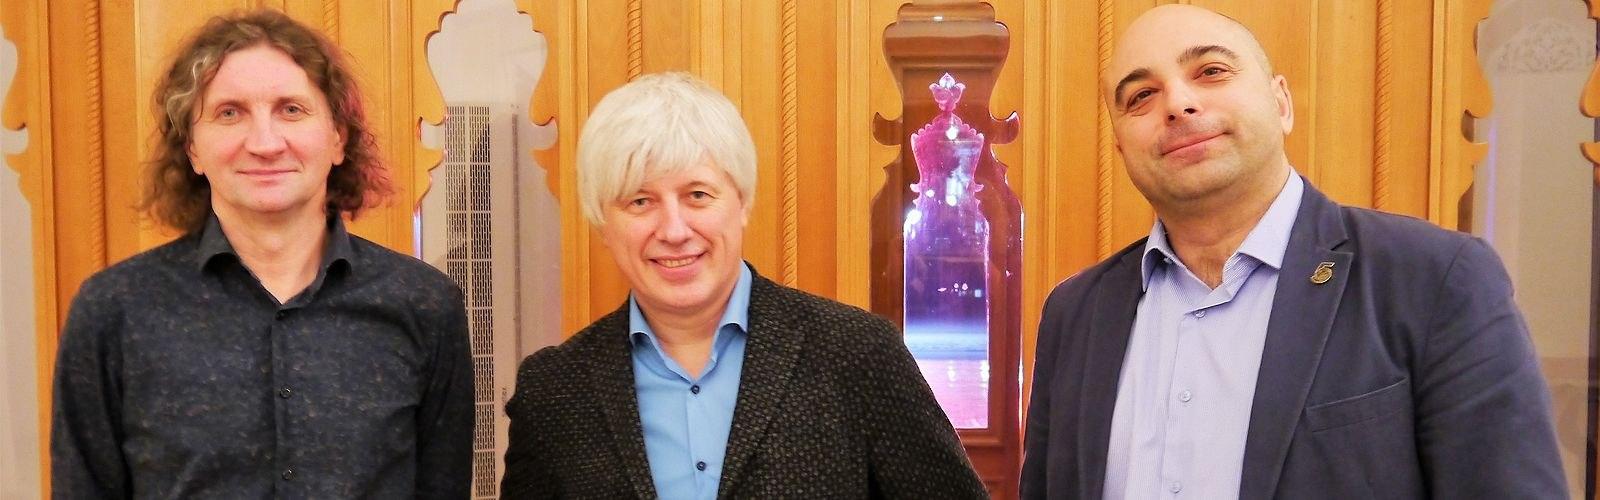 Трио Андрея Кондакова: Владимир Волков (контрабас), Кондаков, Гарий Багдасарьян (барабаны)